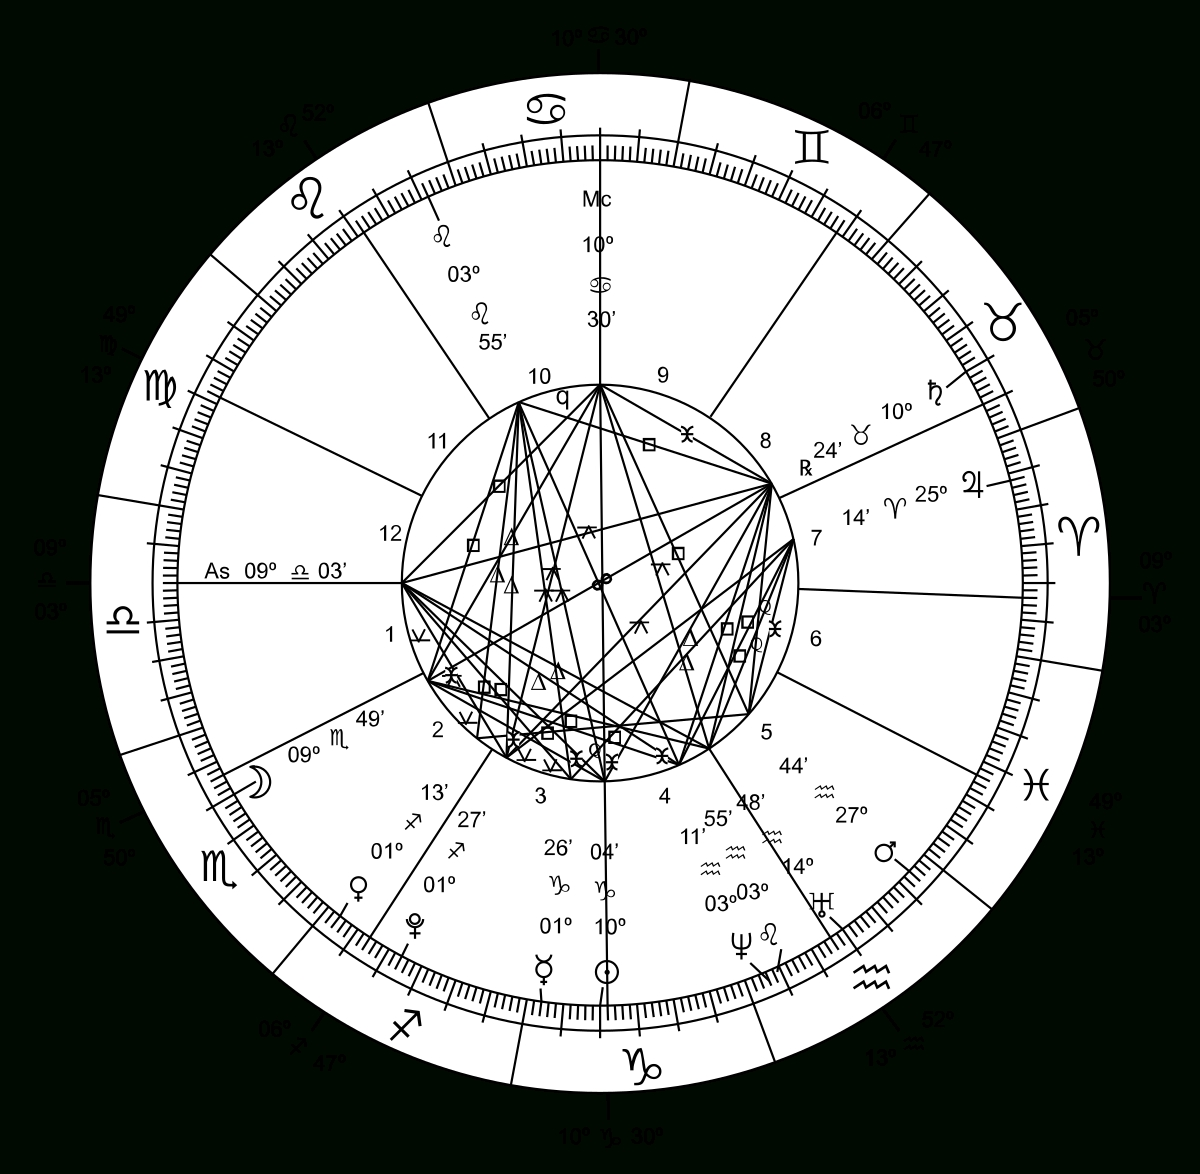 Ophiuchus (Astrology) - Wikipedia